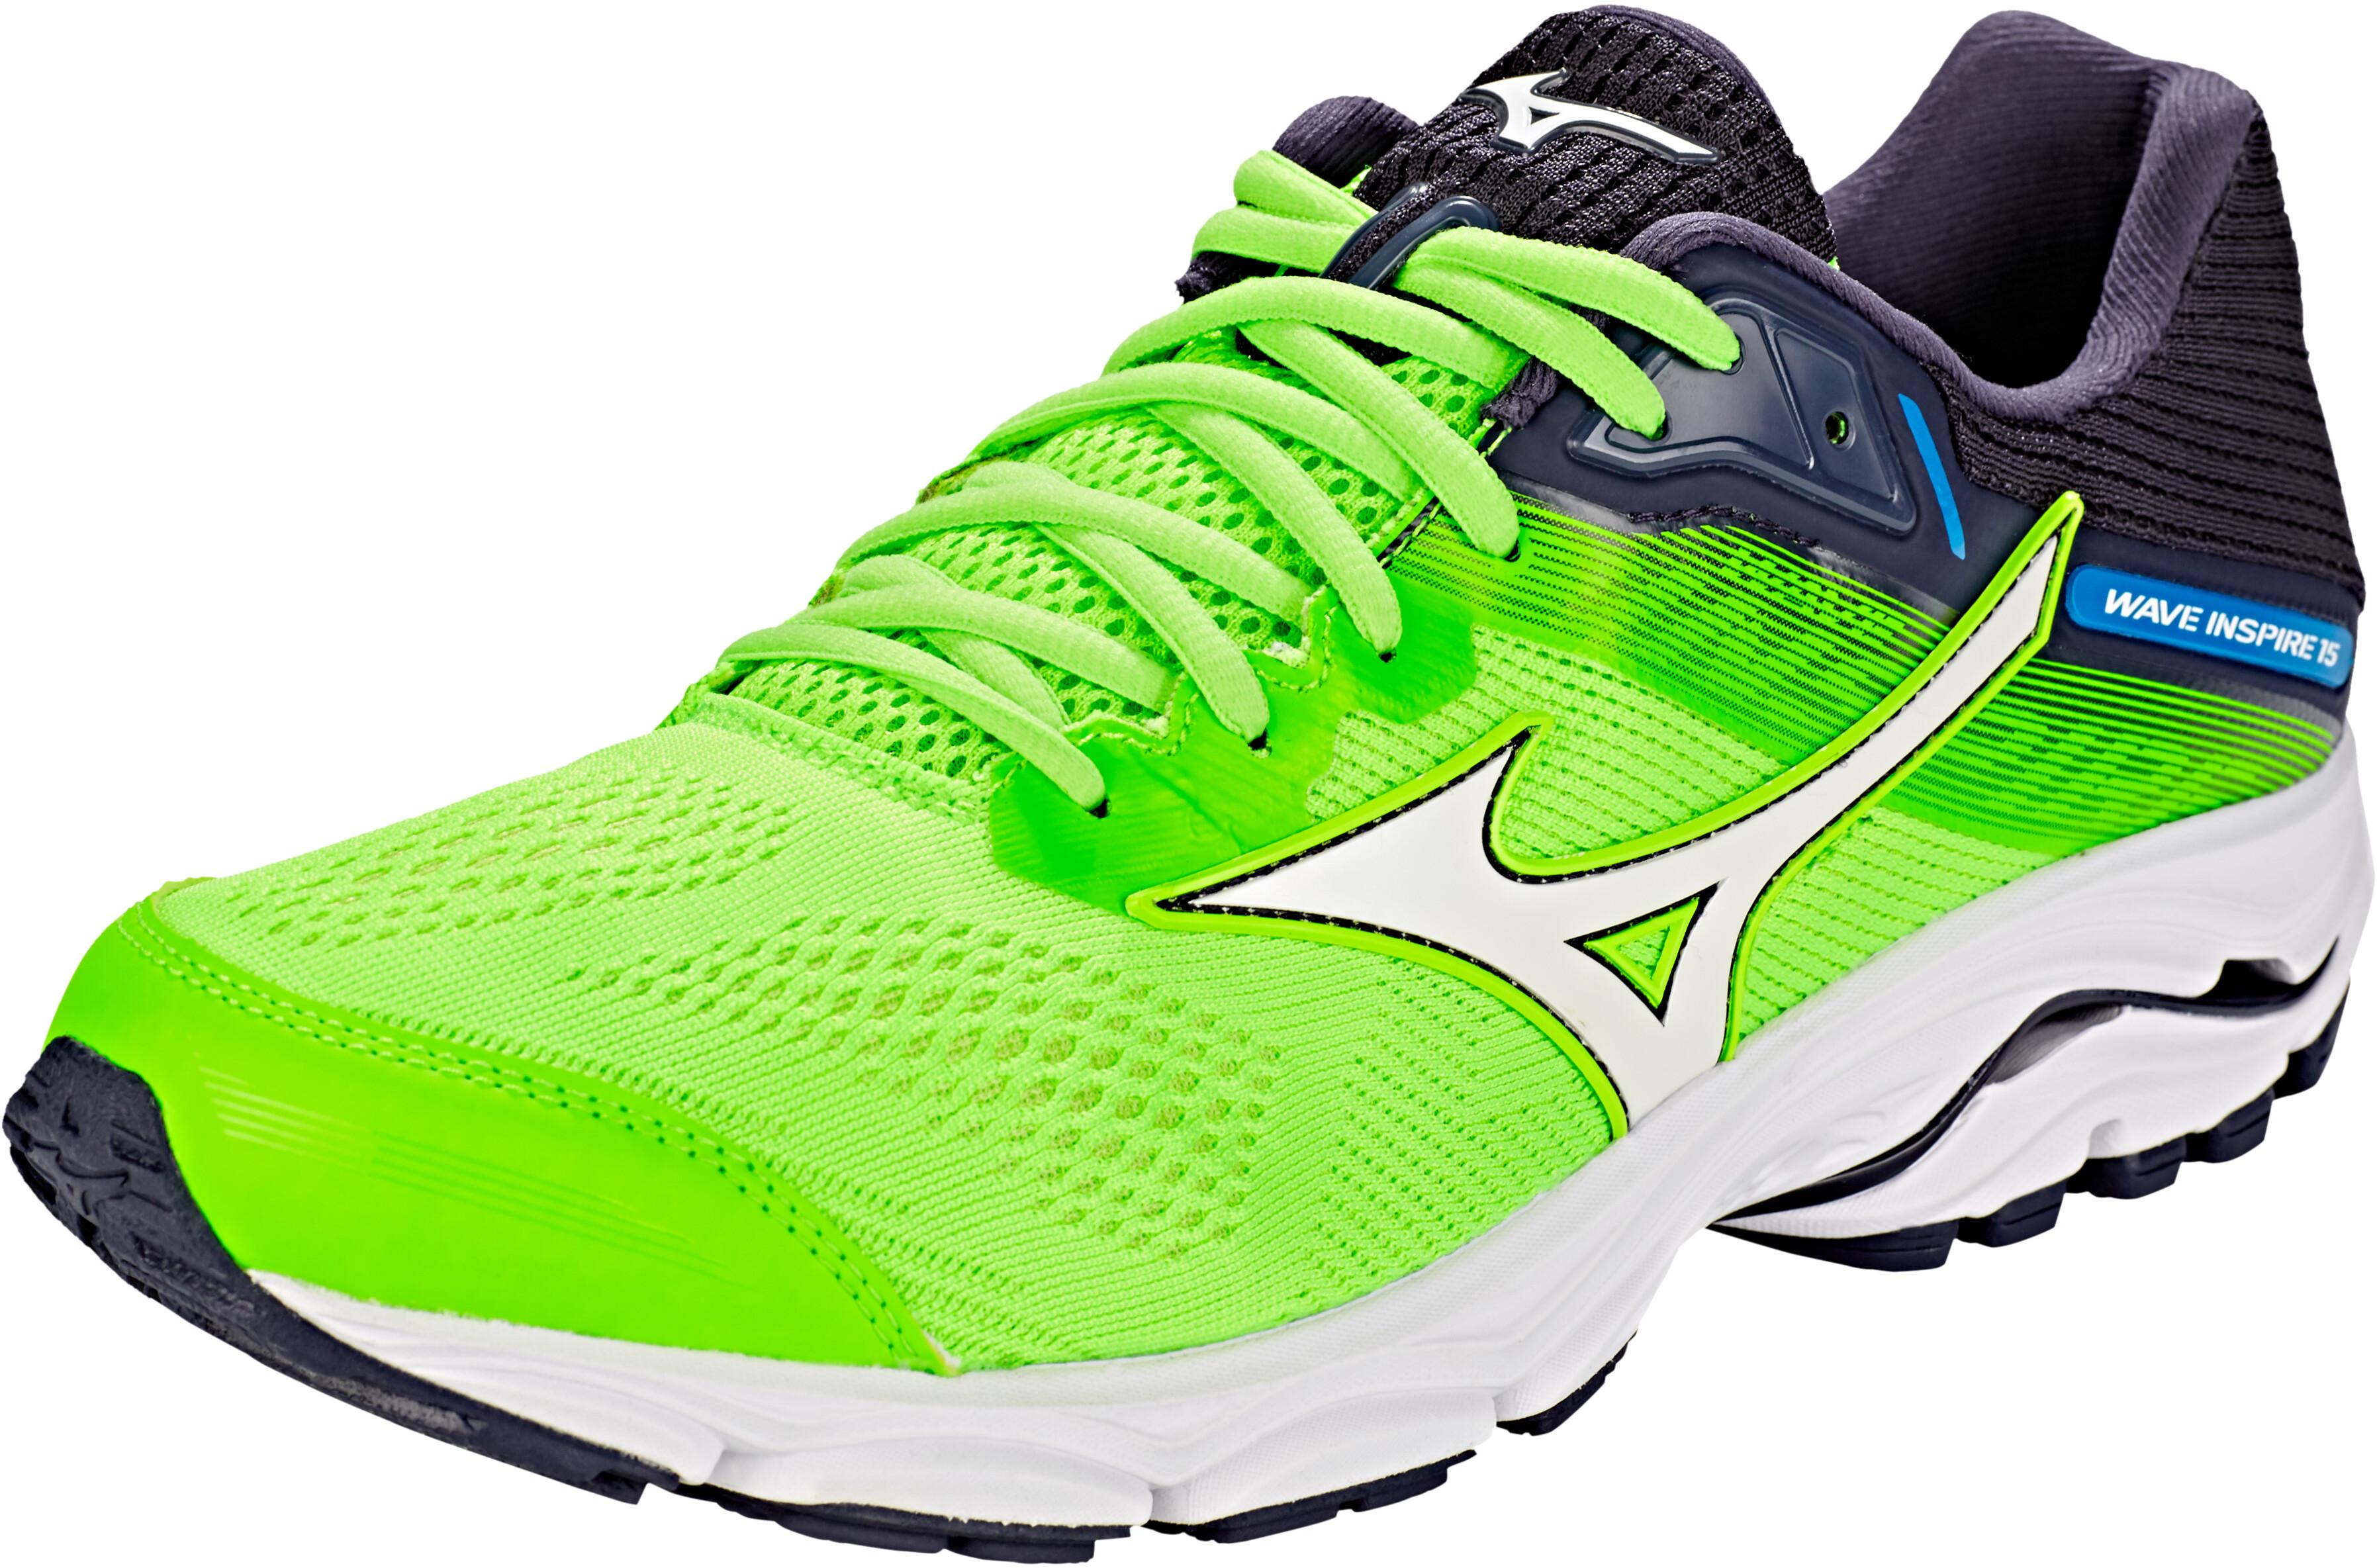 64ed5956219 Mizuno Wave Inspire 15 - Chaussures running Homme - vert blanc ...